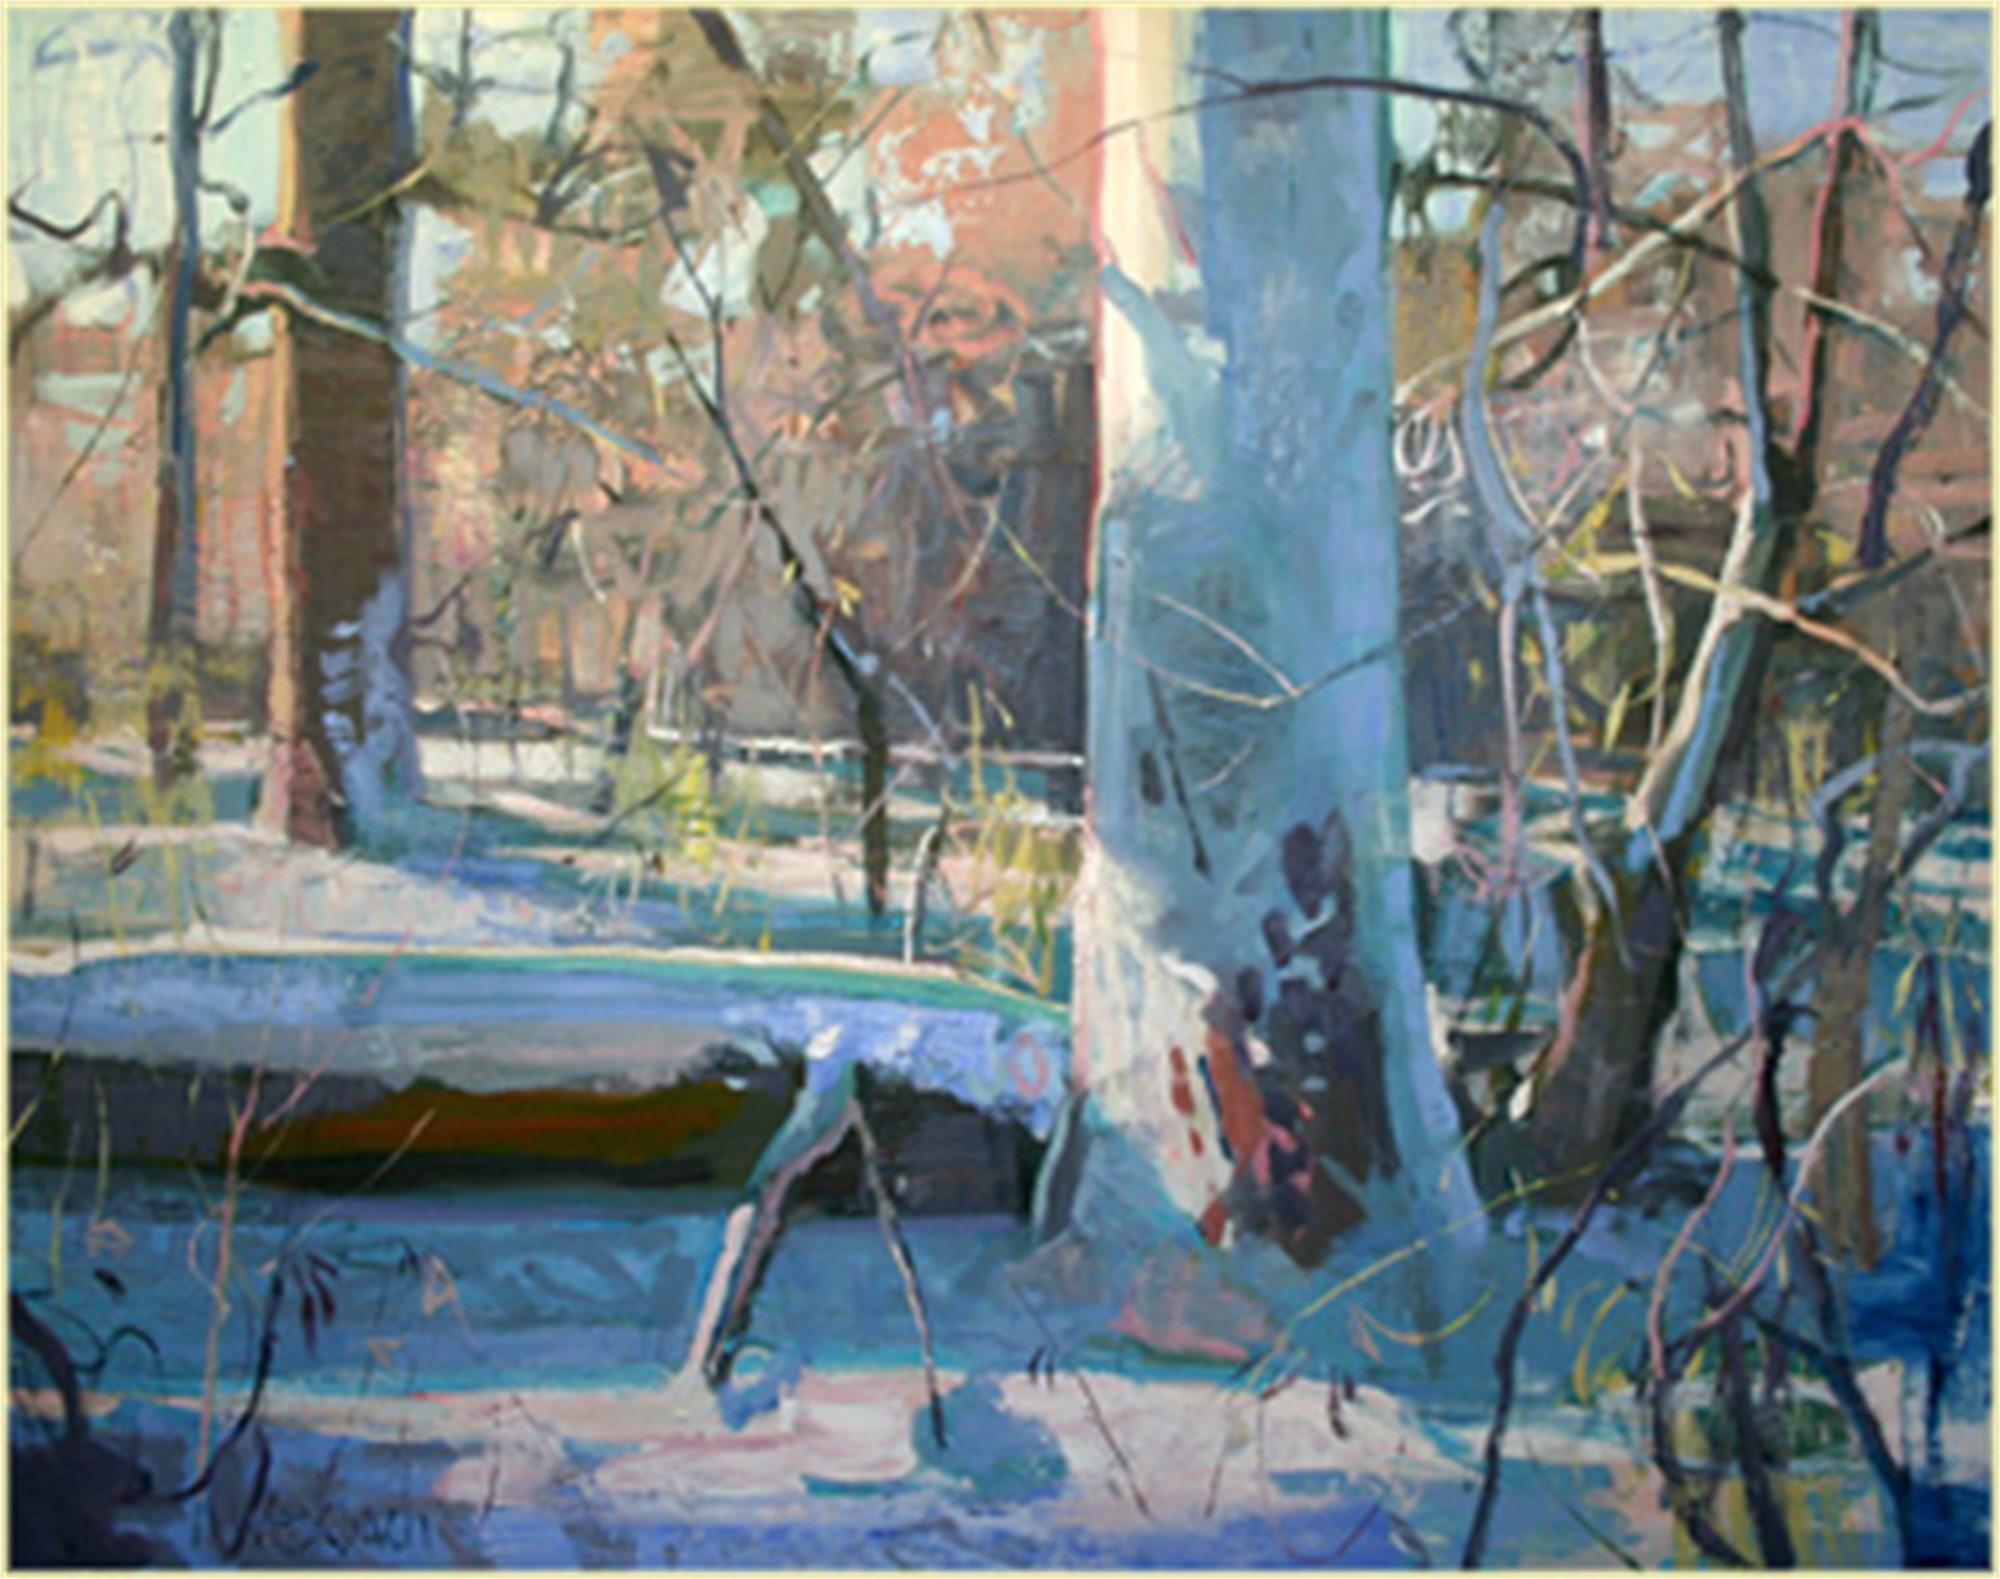 Winter by Kevin Weckbach